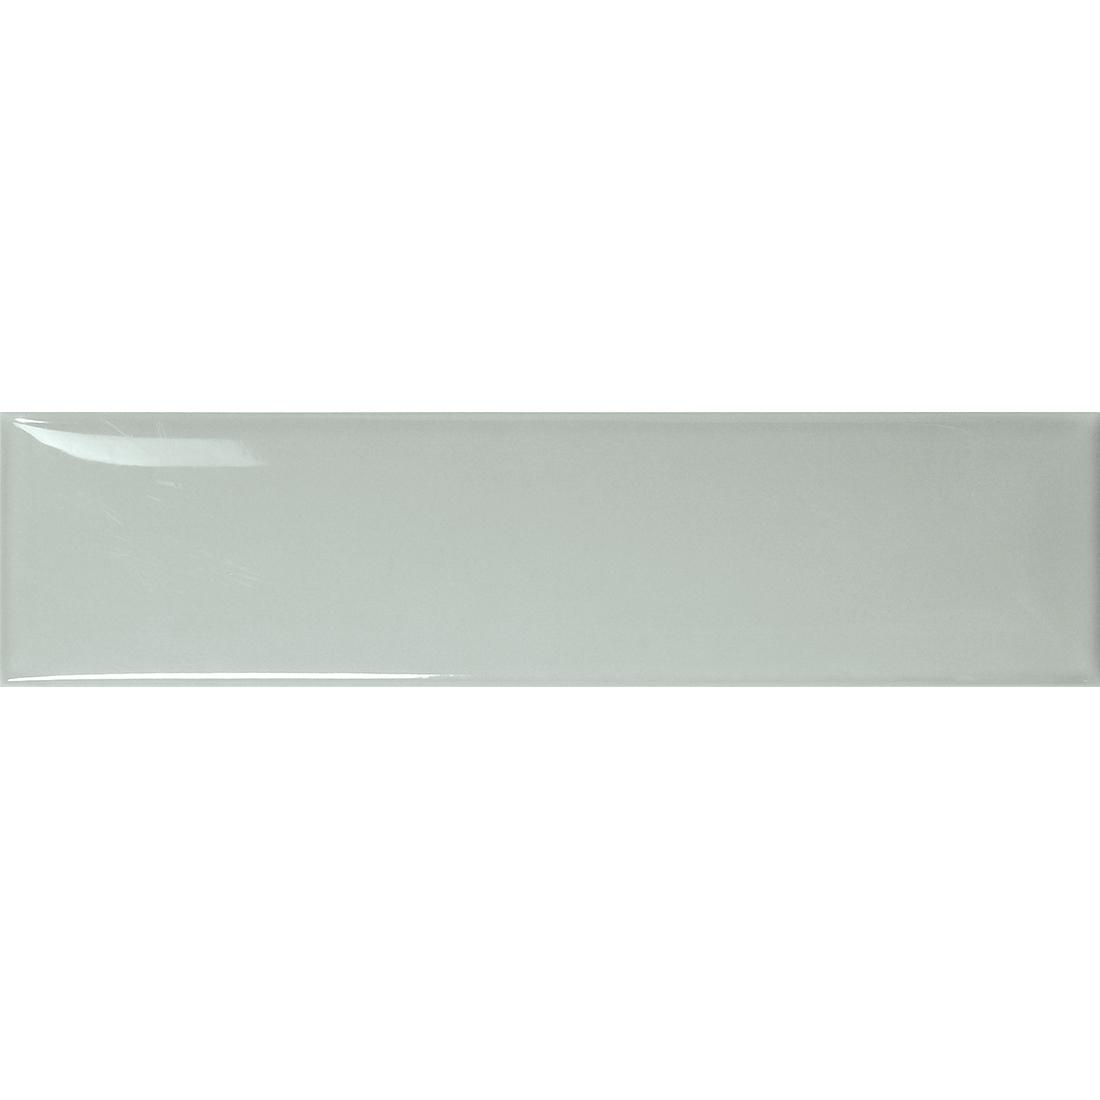 Maine 7.5x30 Ocean Gloss 1